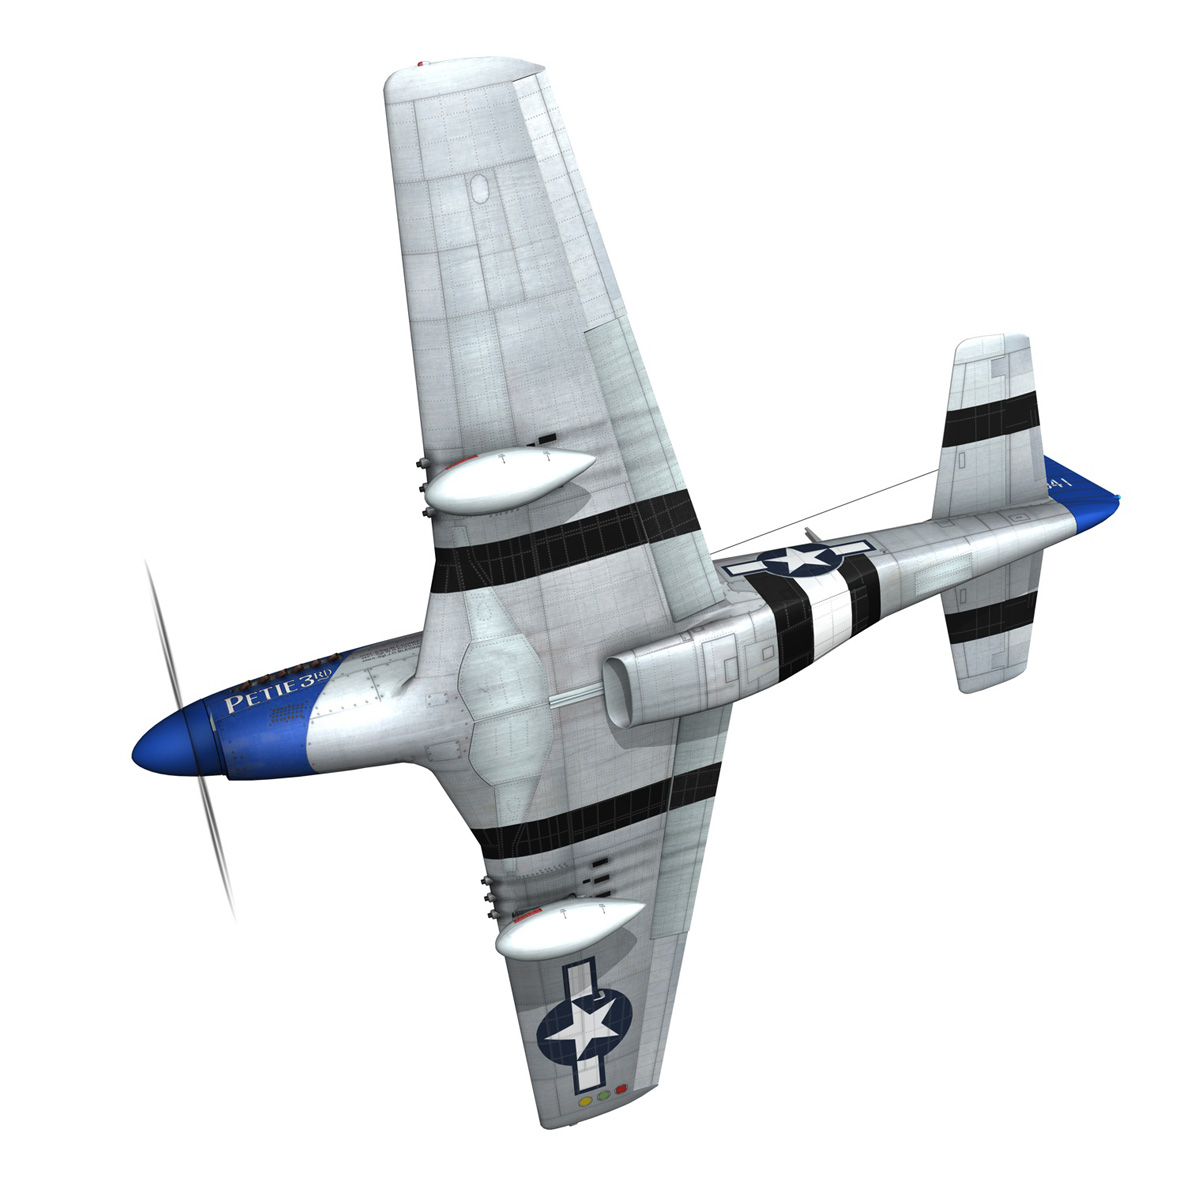 north american p-51d mustang – petie 3rd 3d model fbx c4d lwo obj 280130